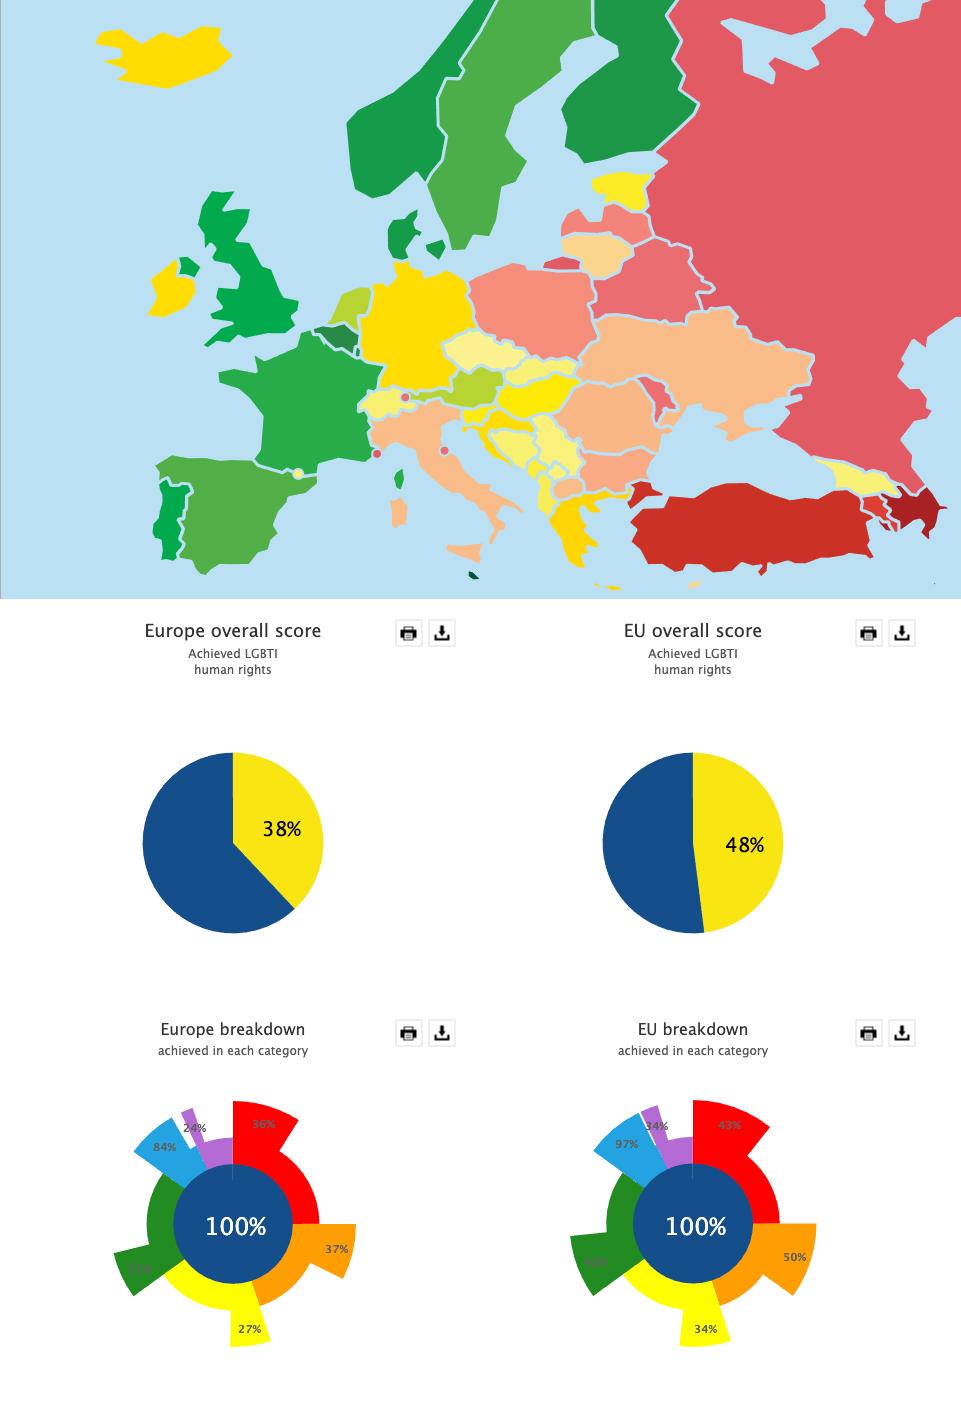 ilga-rainbow-europe-map-bro-bear-blog-1.jpg